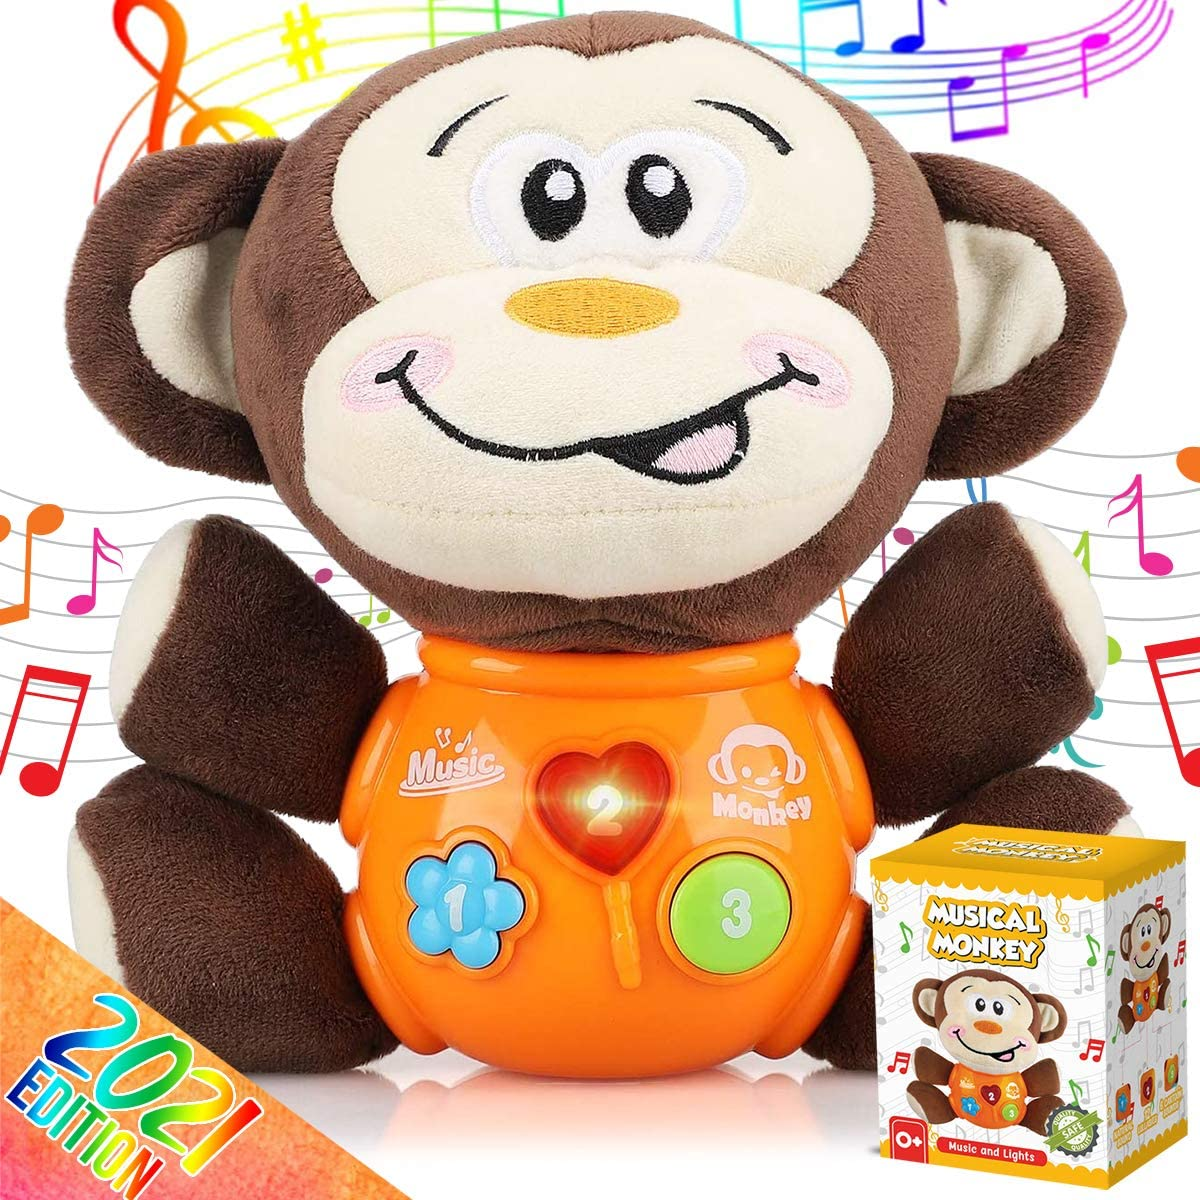 Insnug Plush Monkey Baby Toys To Musical Oakland Mall - Kids New product type Animal